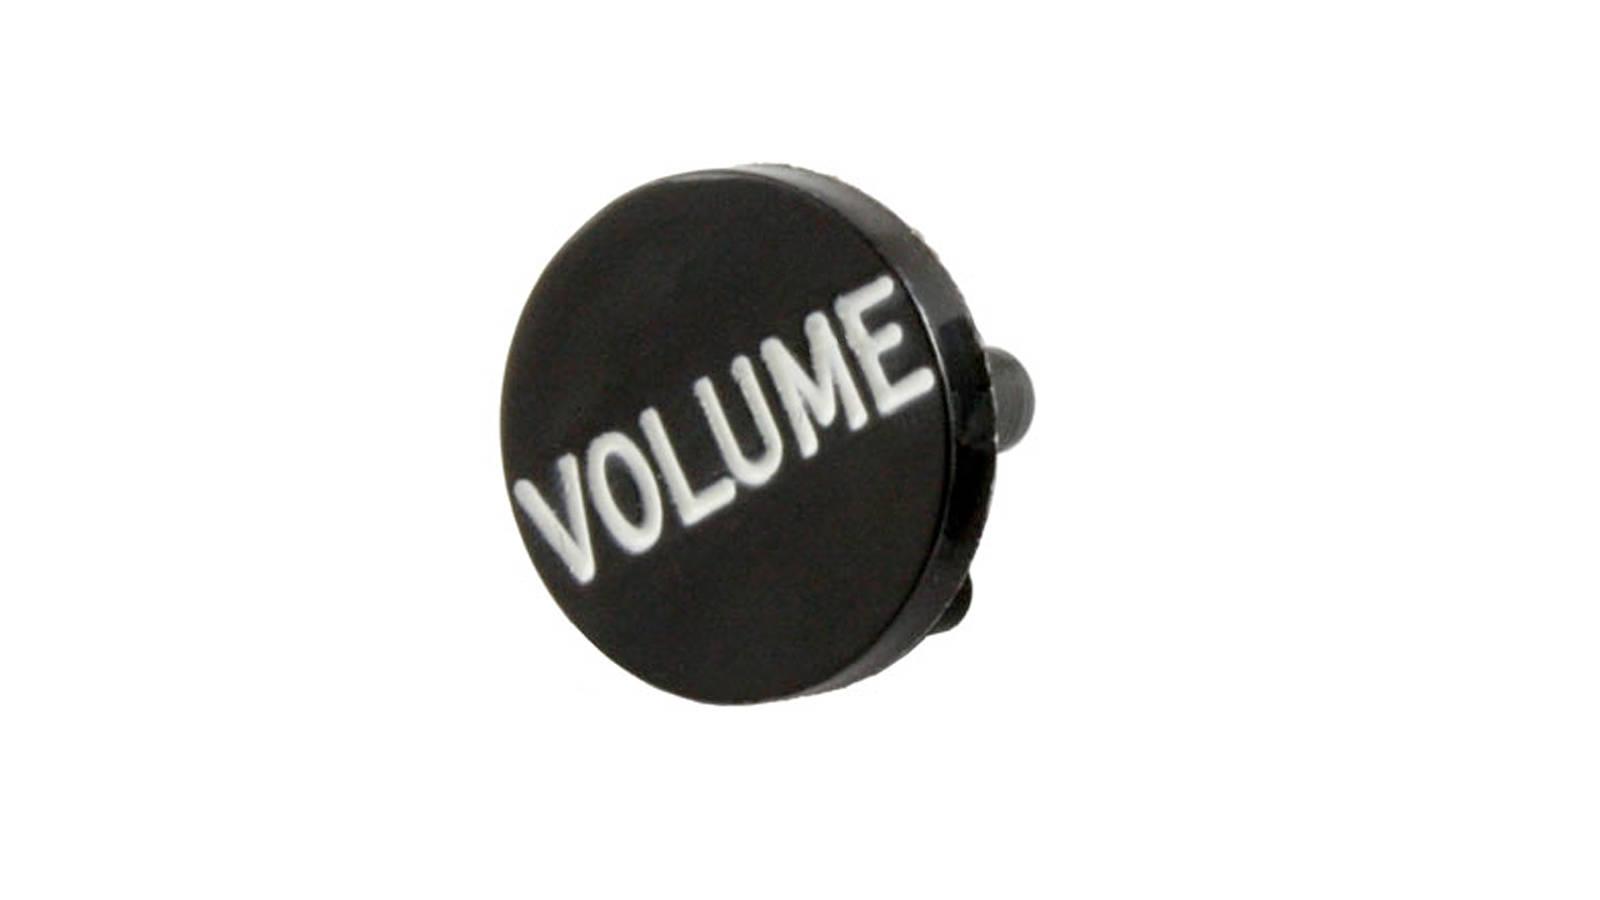 Fender S-1 Switch Knopf Kappe schwarz